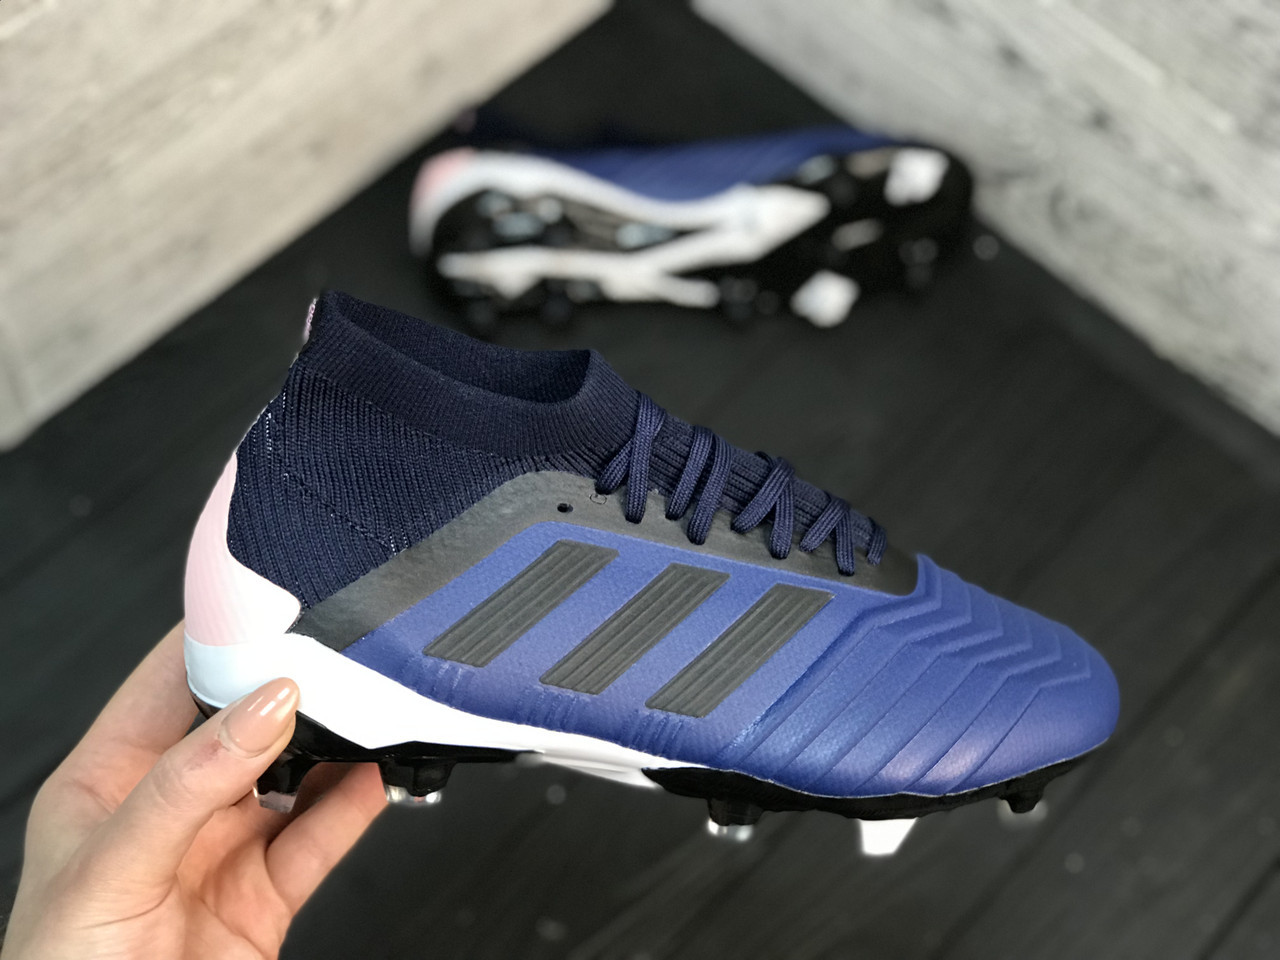 Бутсы Adidas Predator 18+FG/адидас предатор (реплика)